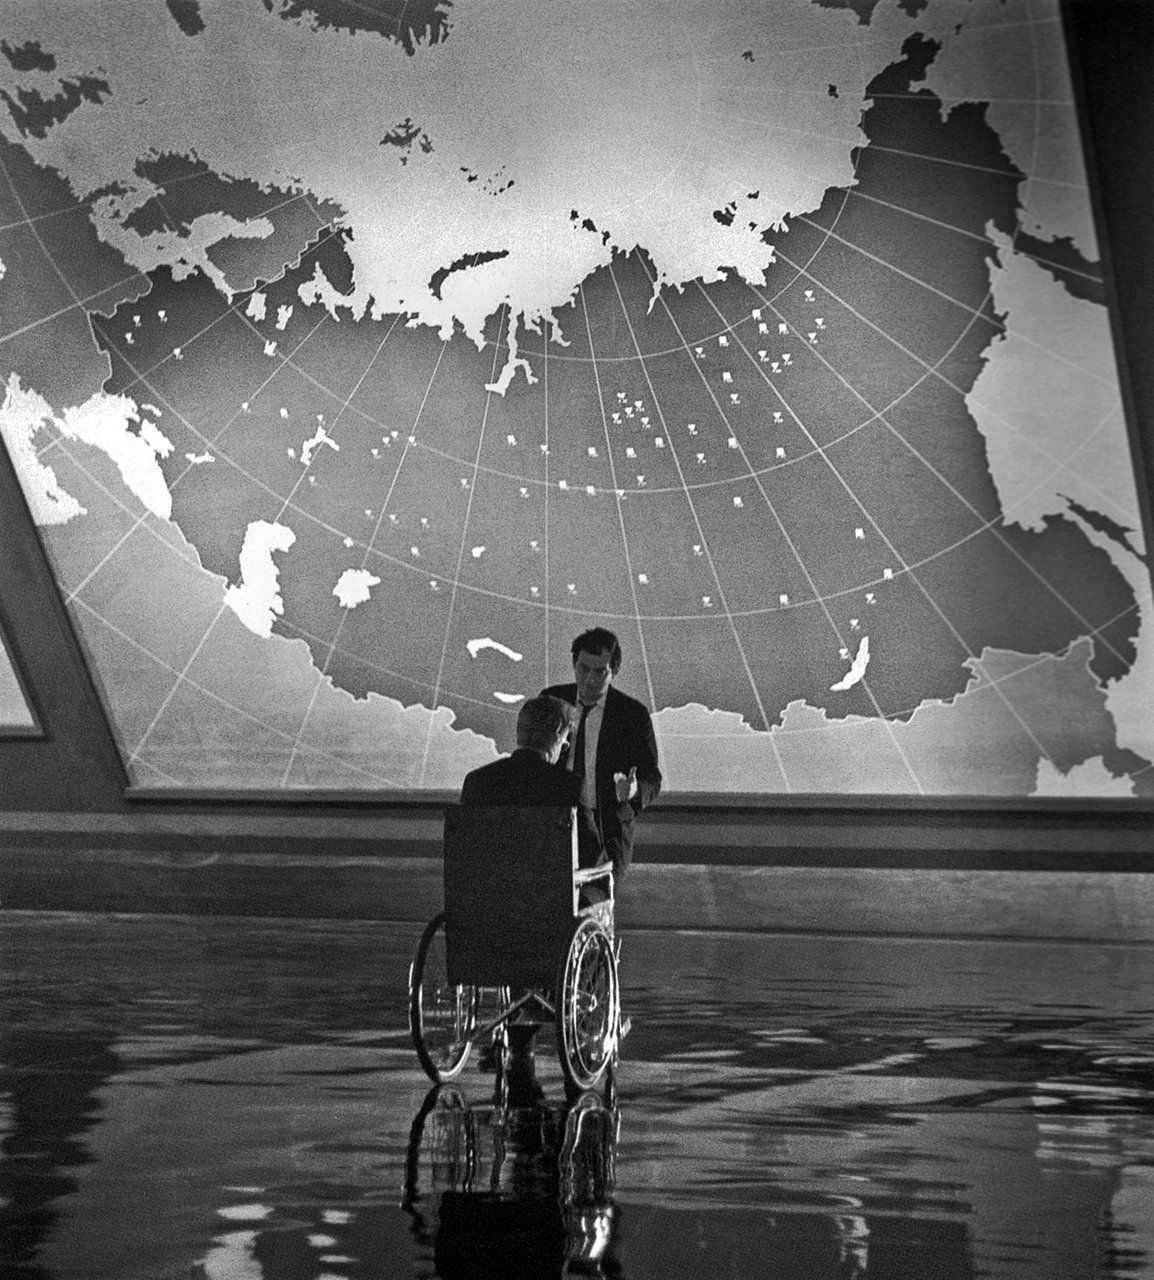 Stanley Kubrick's 'Dr. Strangelove': The Sharpest, Most Cautioning, Hilarious Political Satire